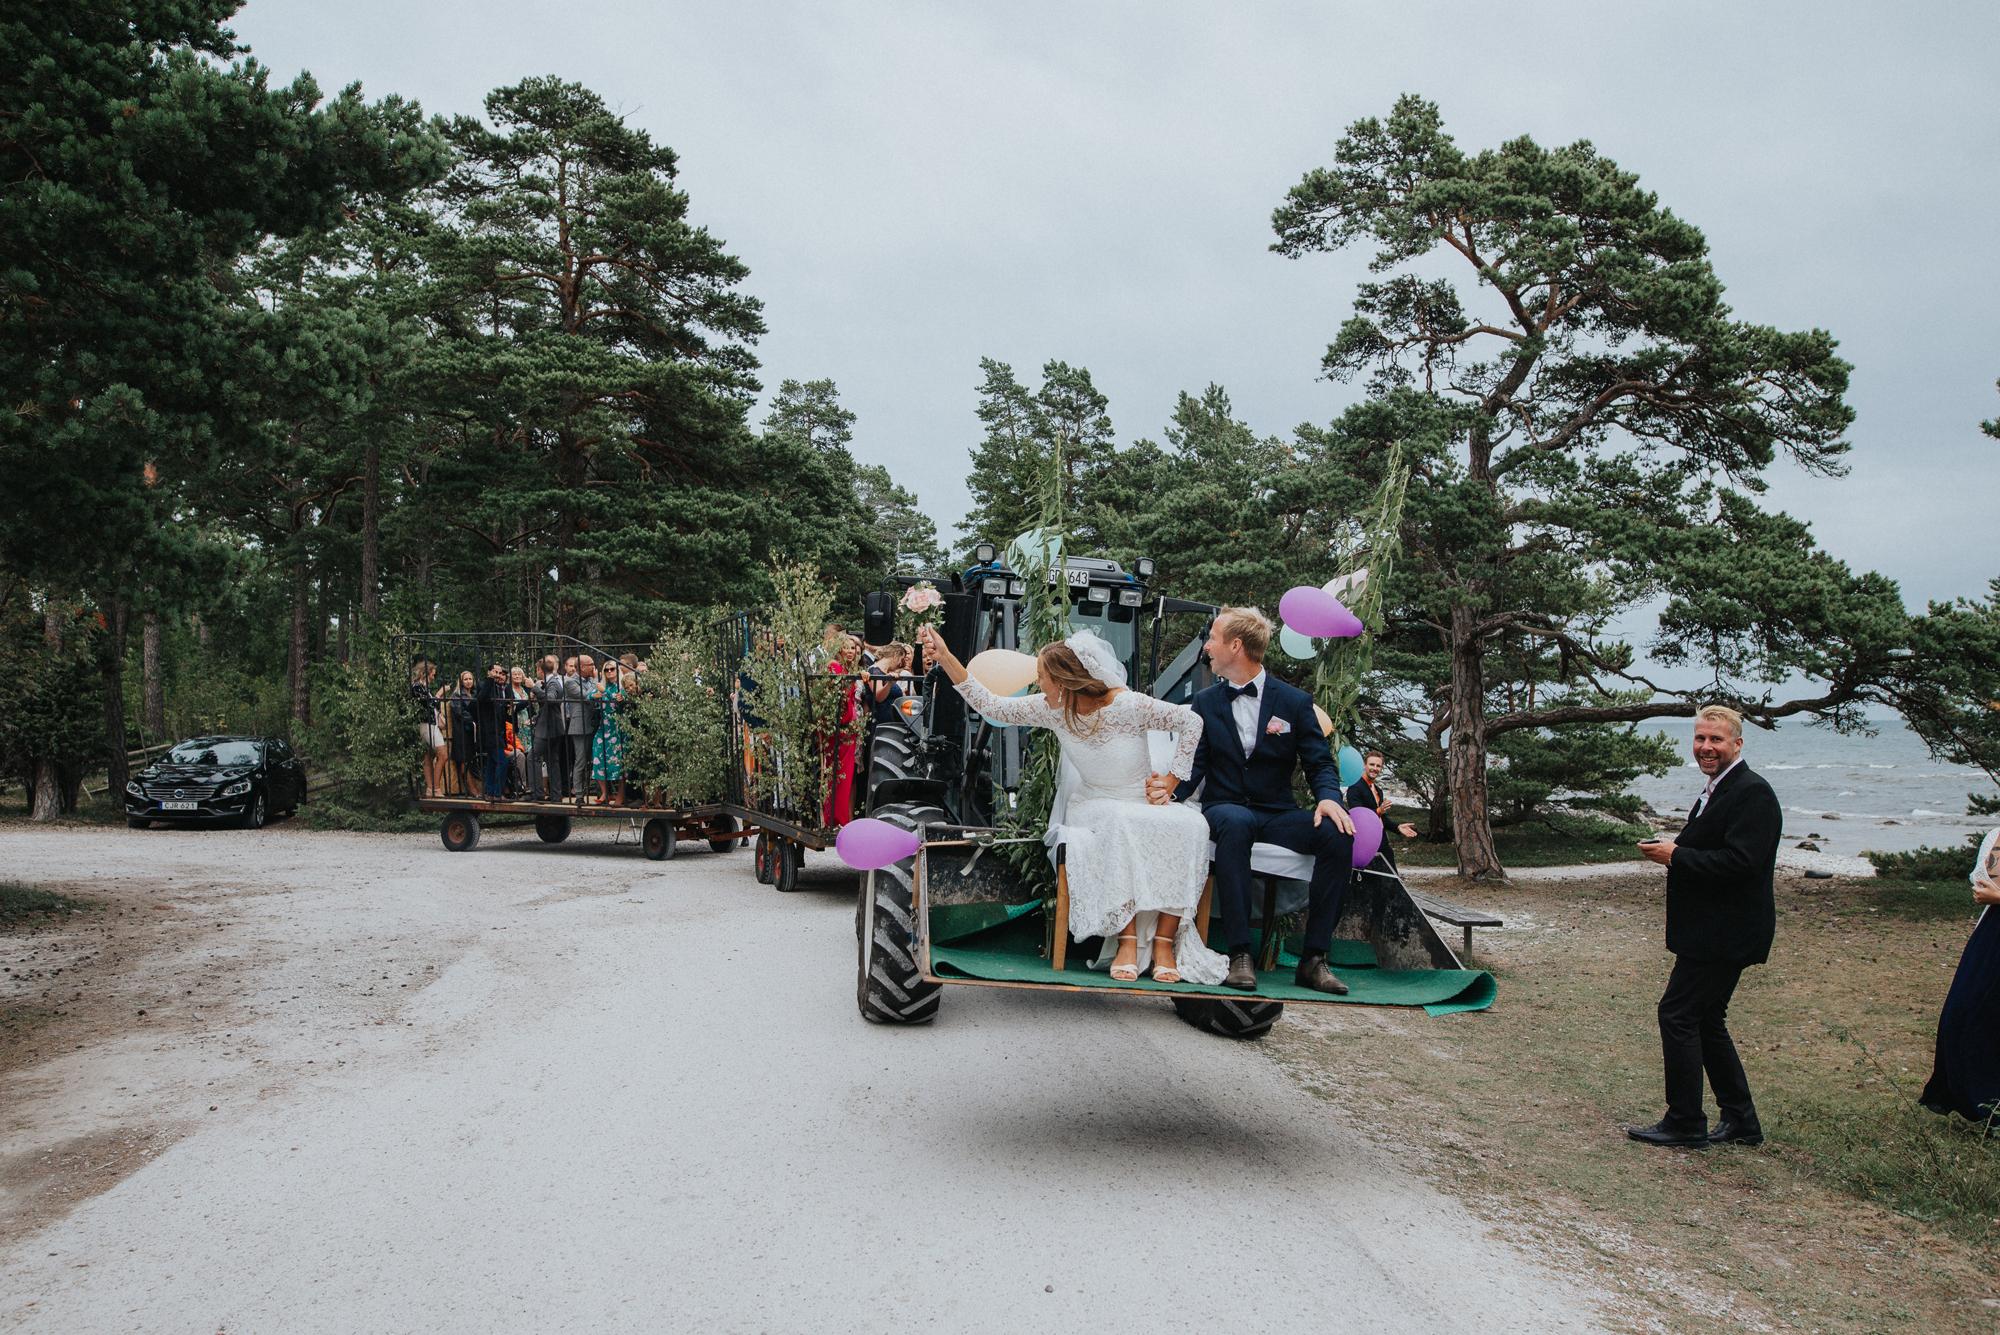 048-bröllopsfotograf-folhammar-gotland-neas-fotografi.jpg